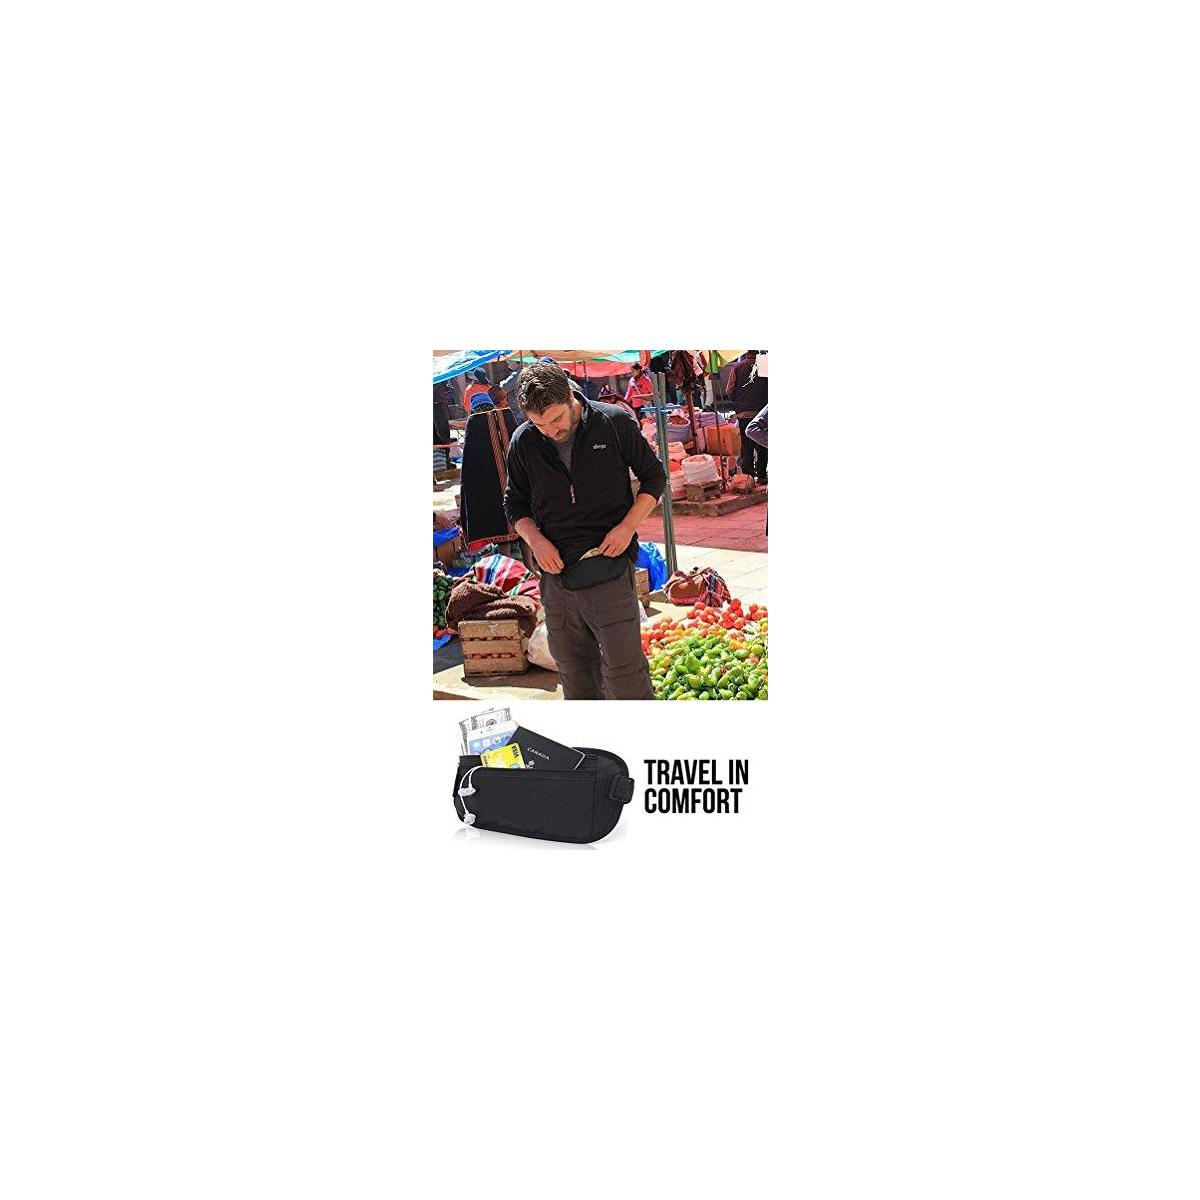 Money Belt for Travel, by Gama - RFID Blocking Fanny Pack, Hidden Passport Holder for Men Women - Keep Slim & Under Clothes to Prevent Pick Pocketers - Black Wallet fit Money, Credit Cards, Phone